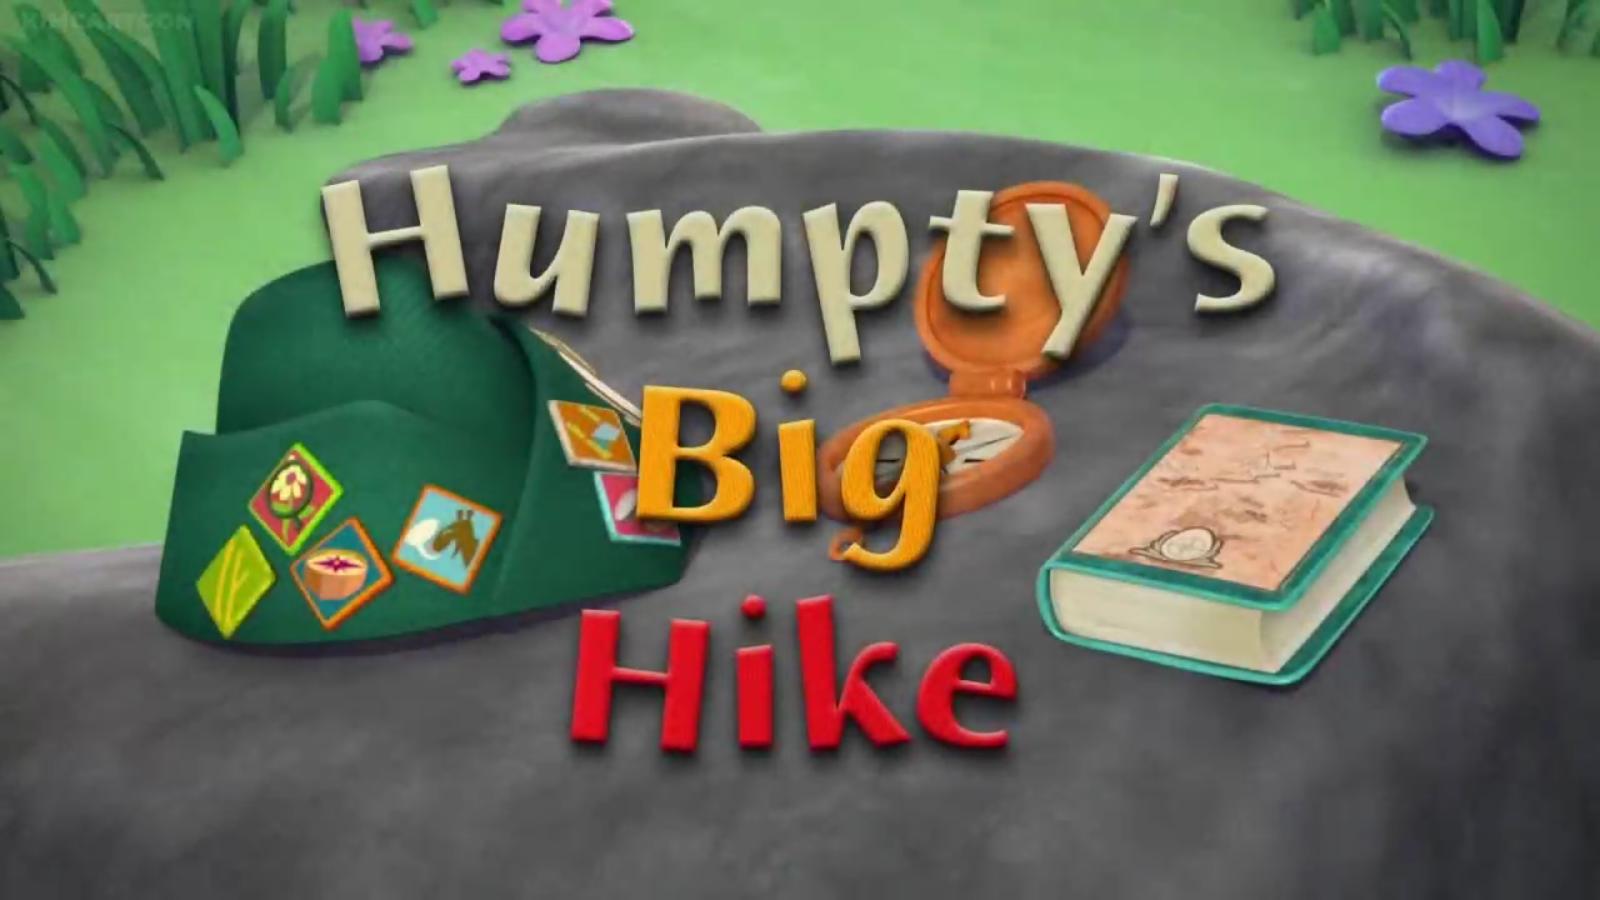 Humpty's Big Hike